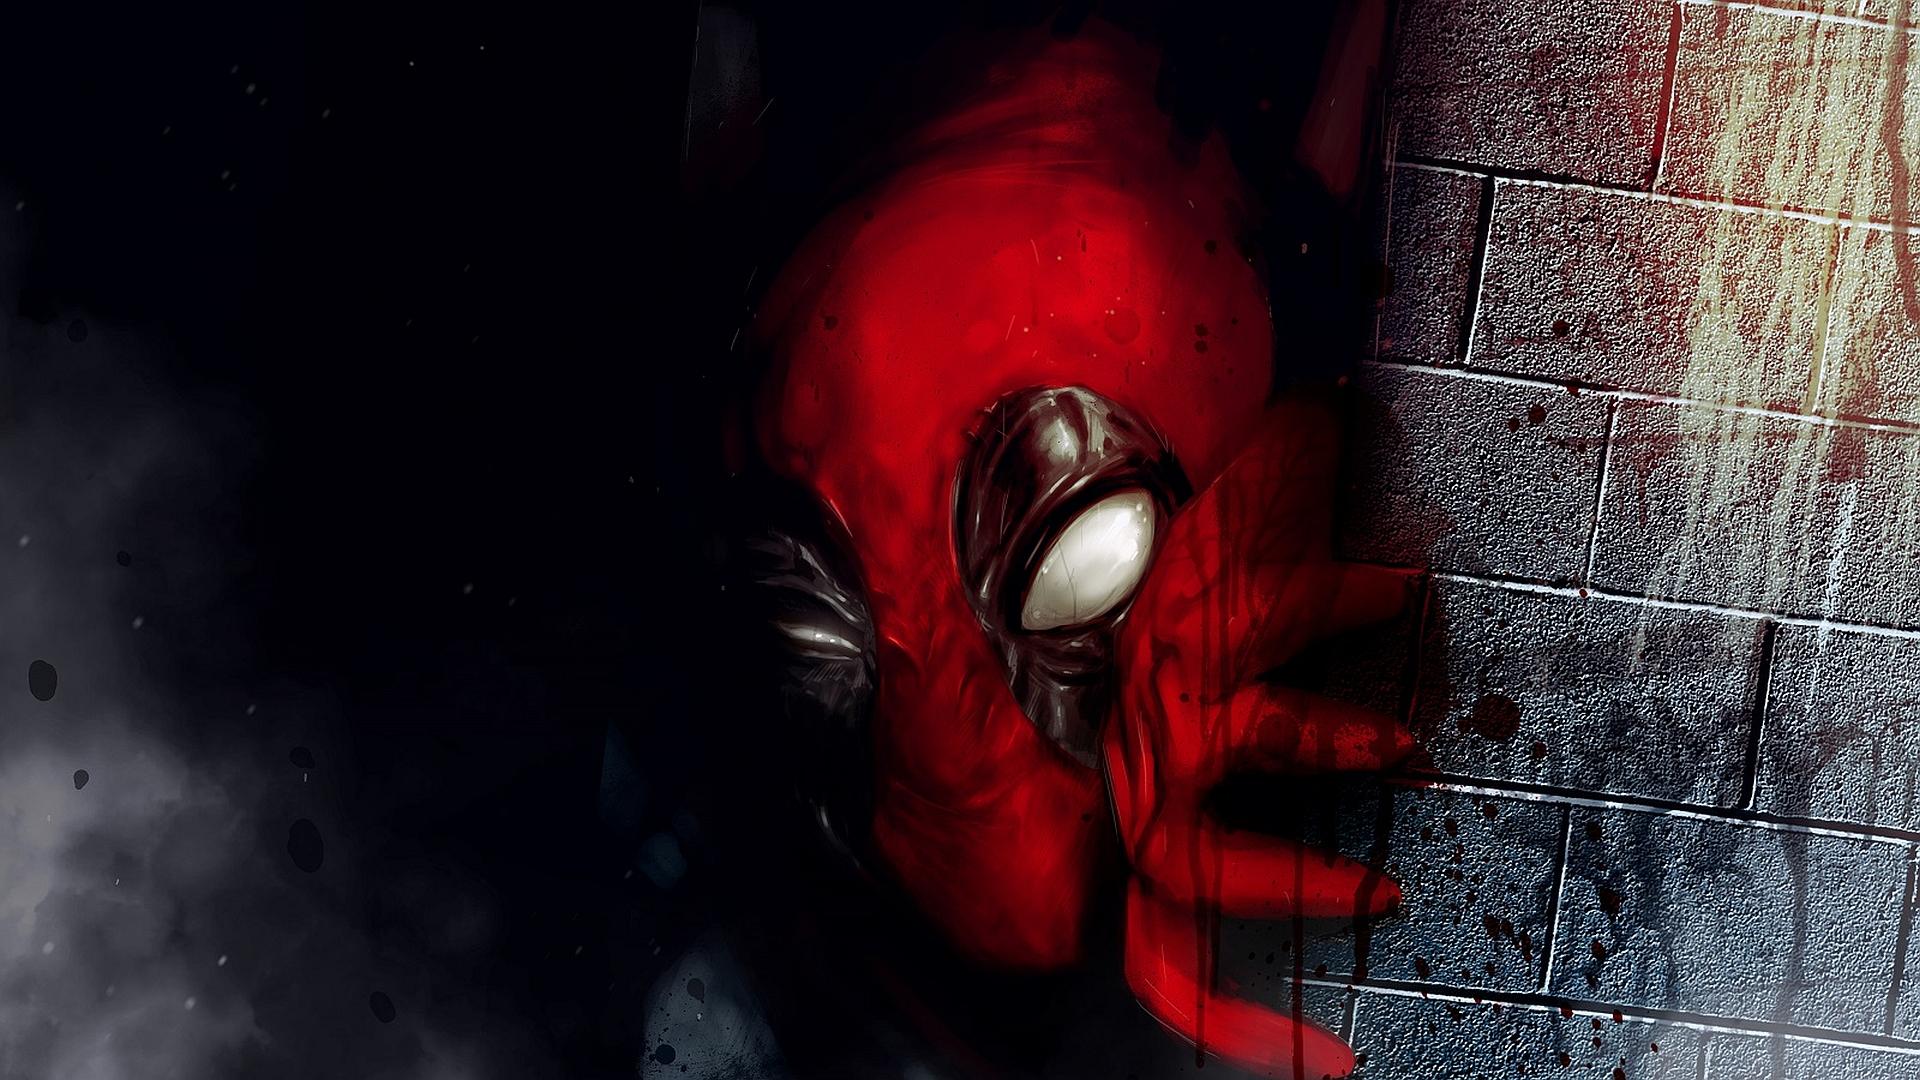 Deadpool full hd wallpaper and background image for Deviantart wallpaper